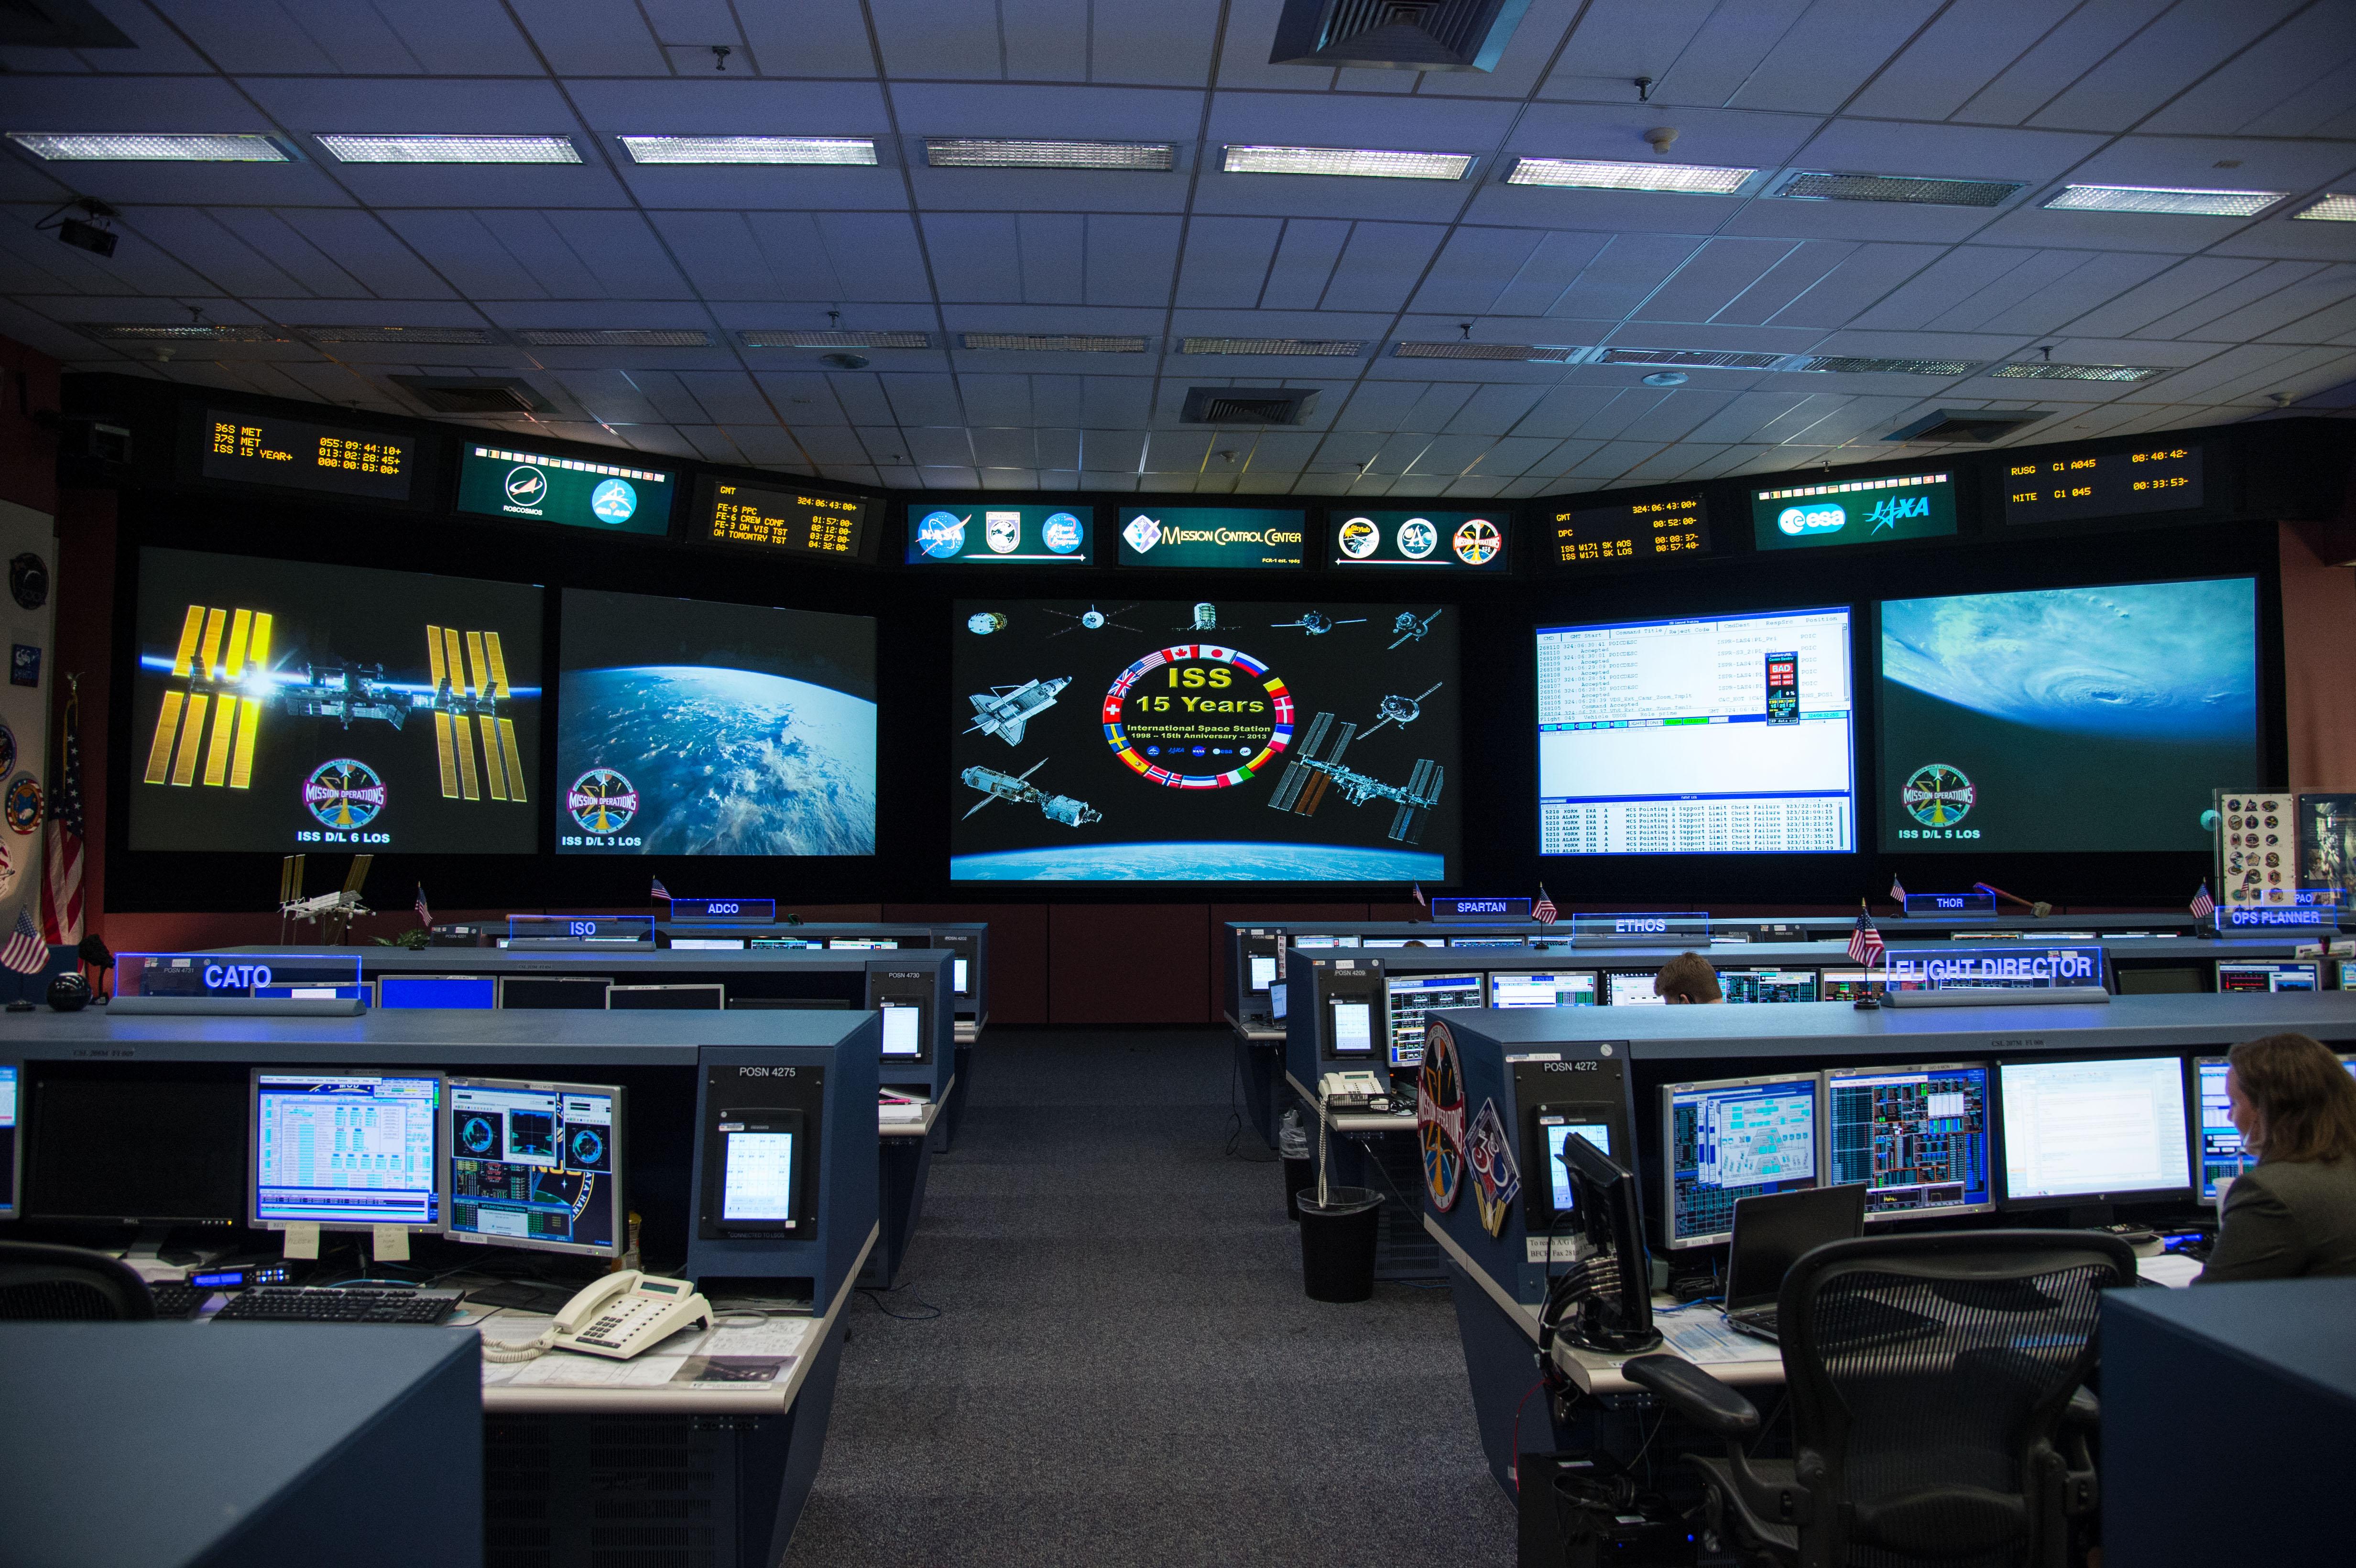 Space Station Flight Control Room | NASA